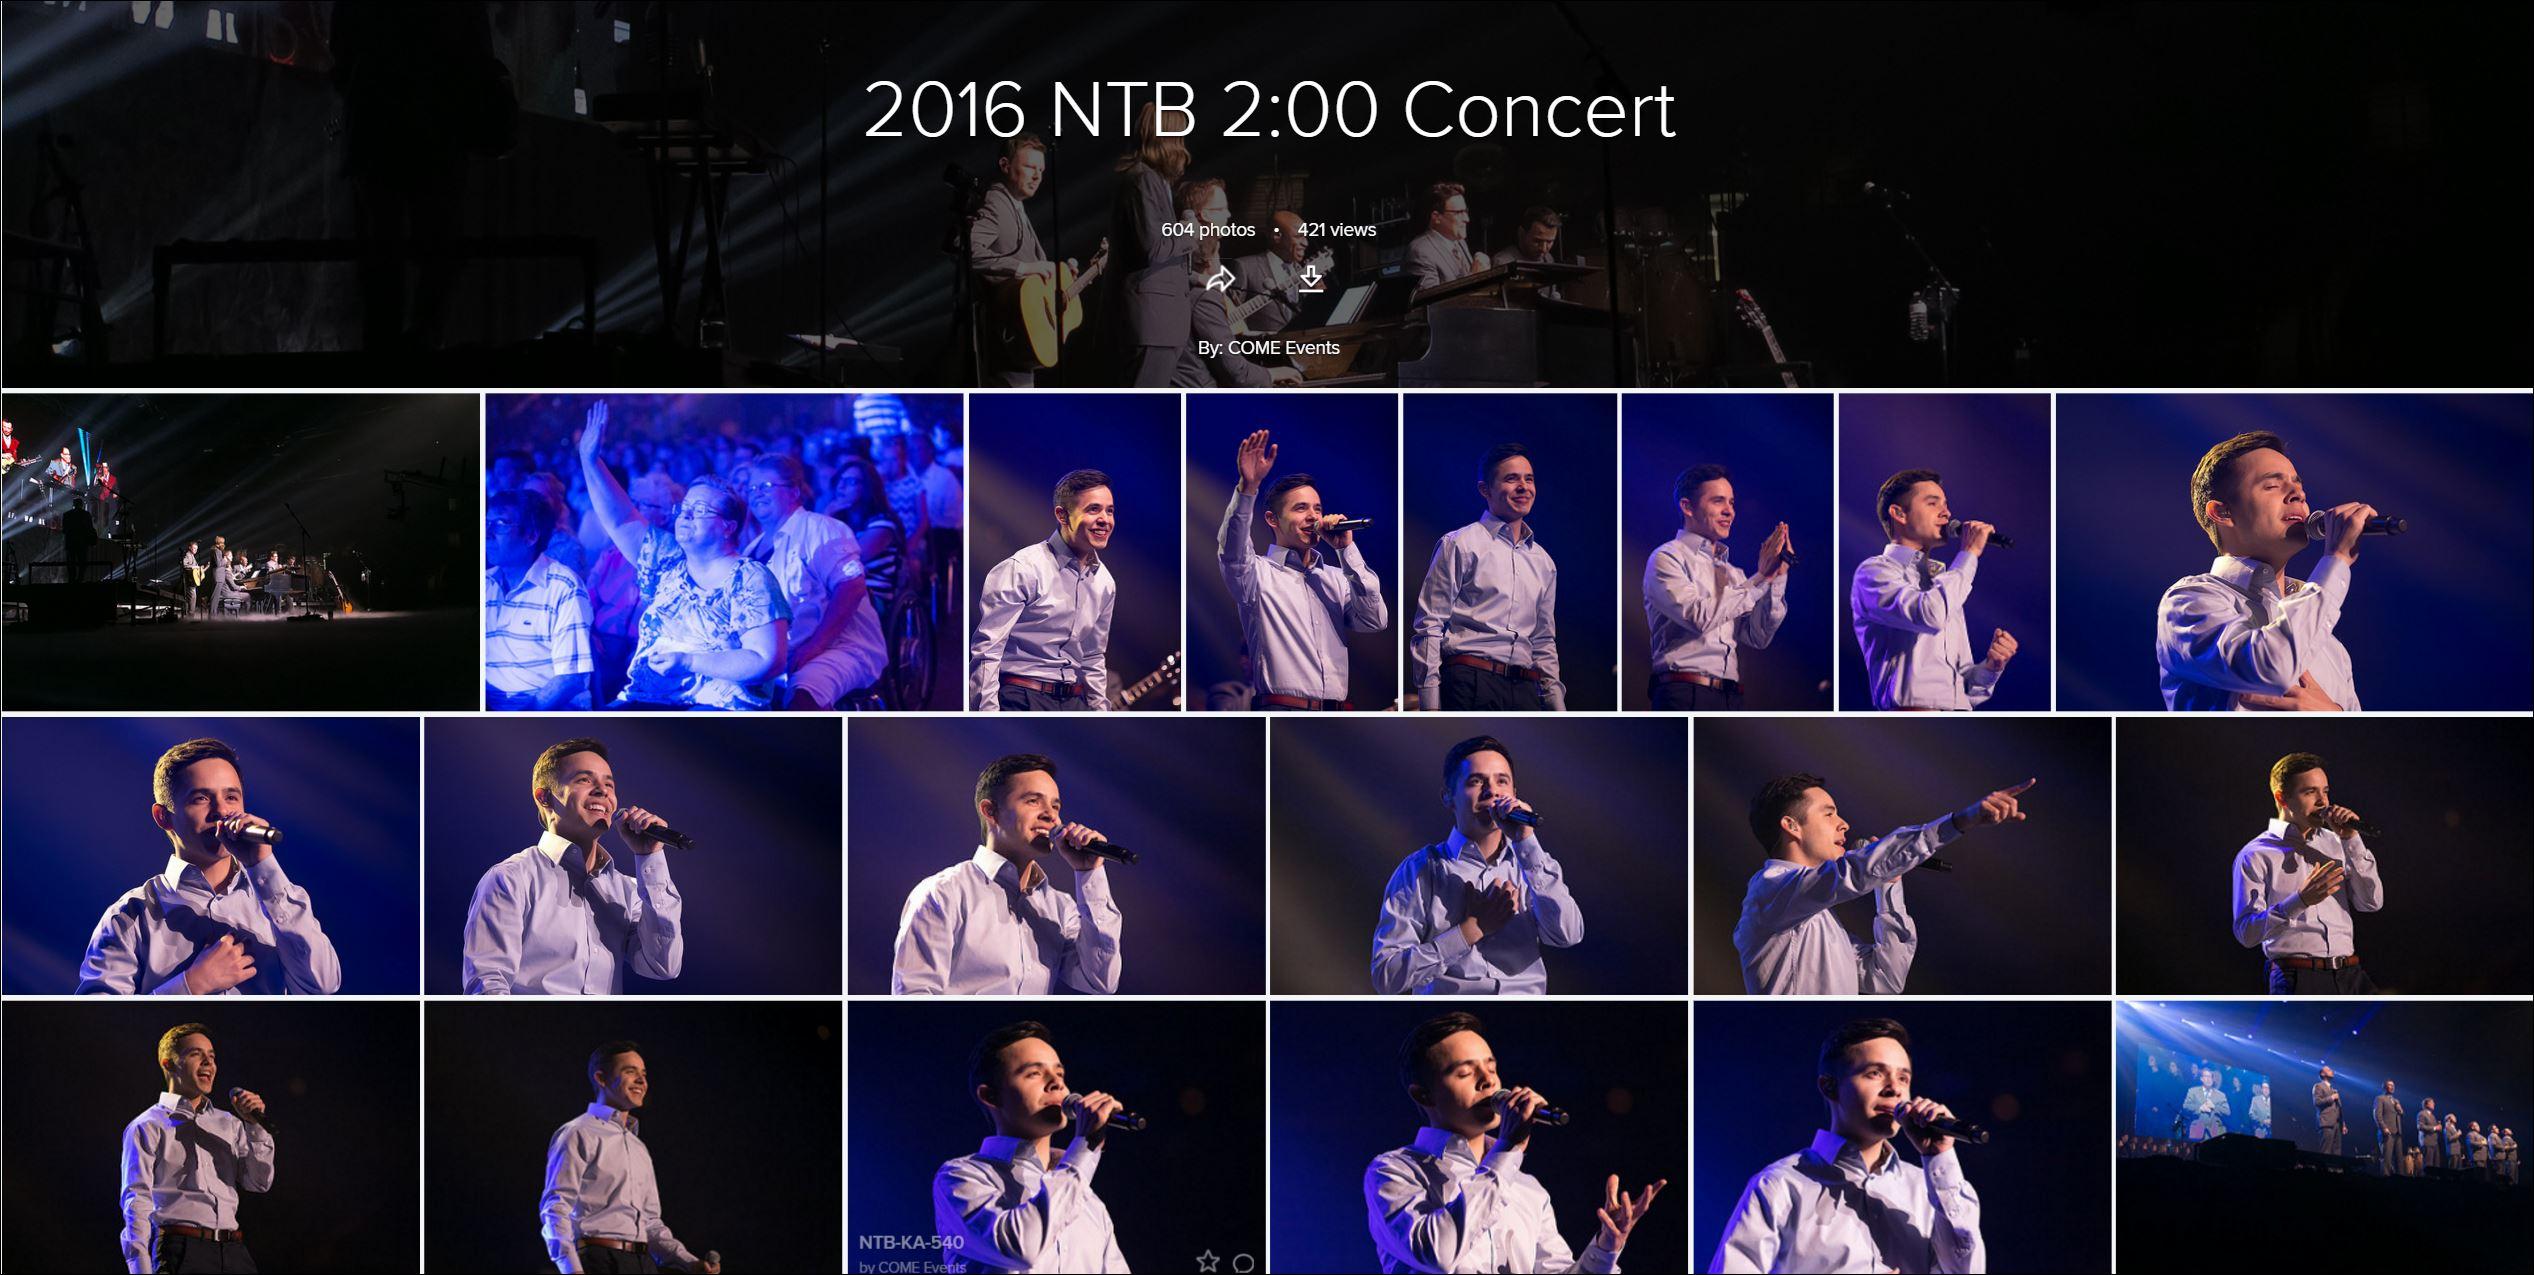 2016 NTB 2 pm concert